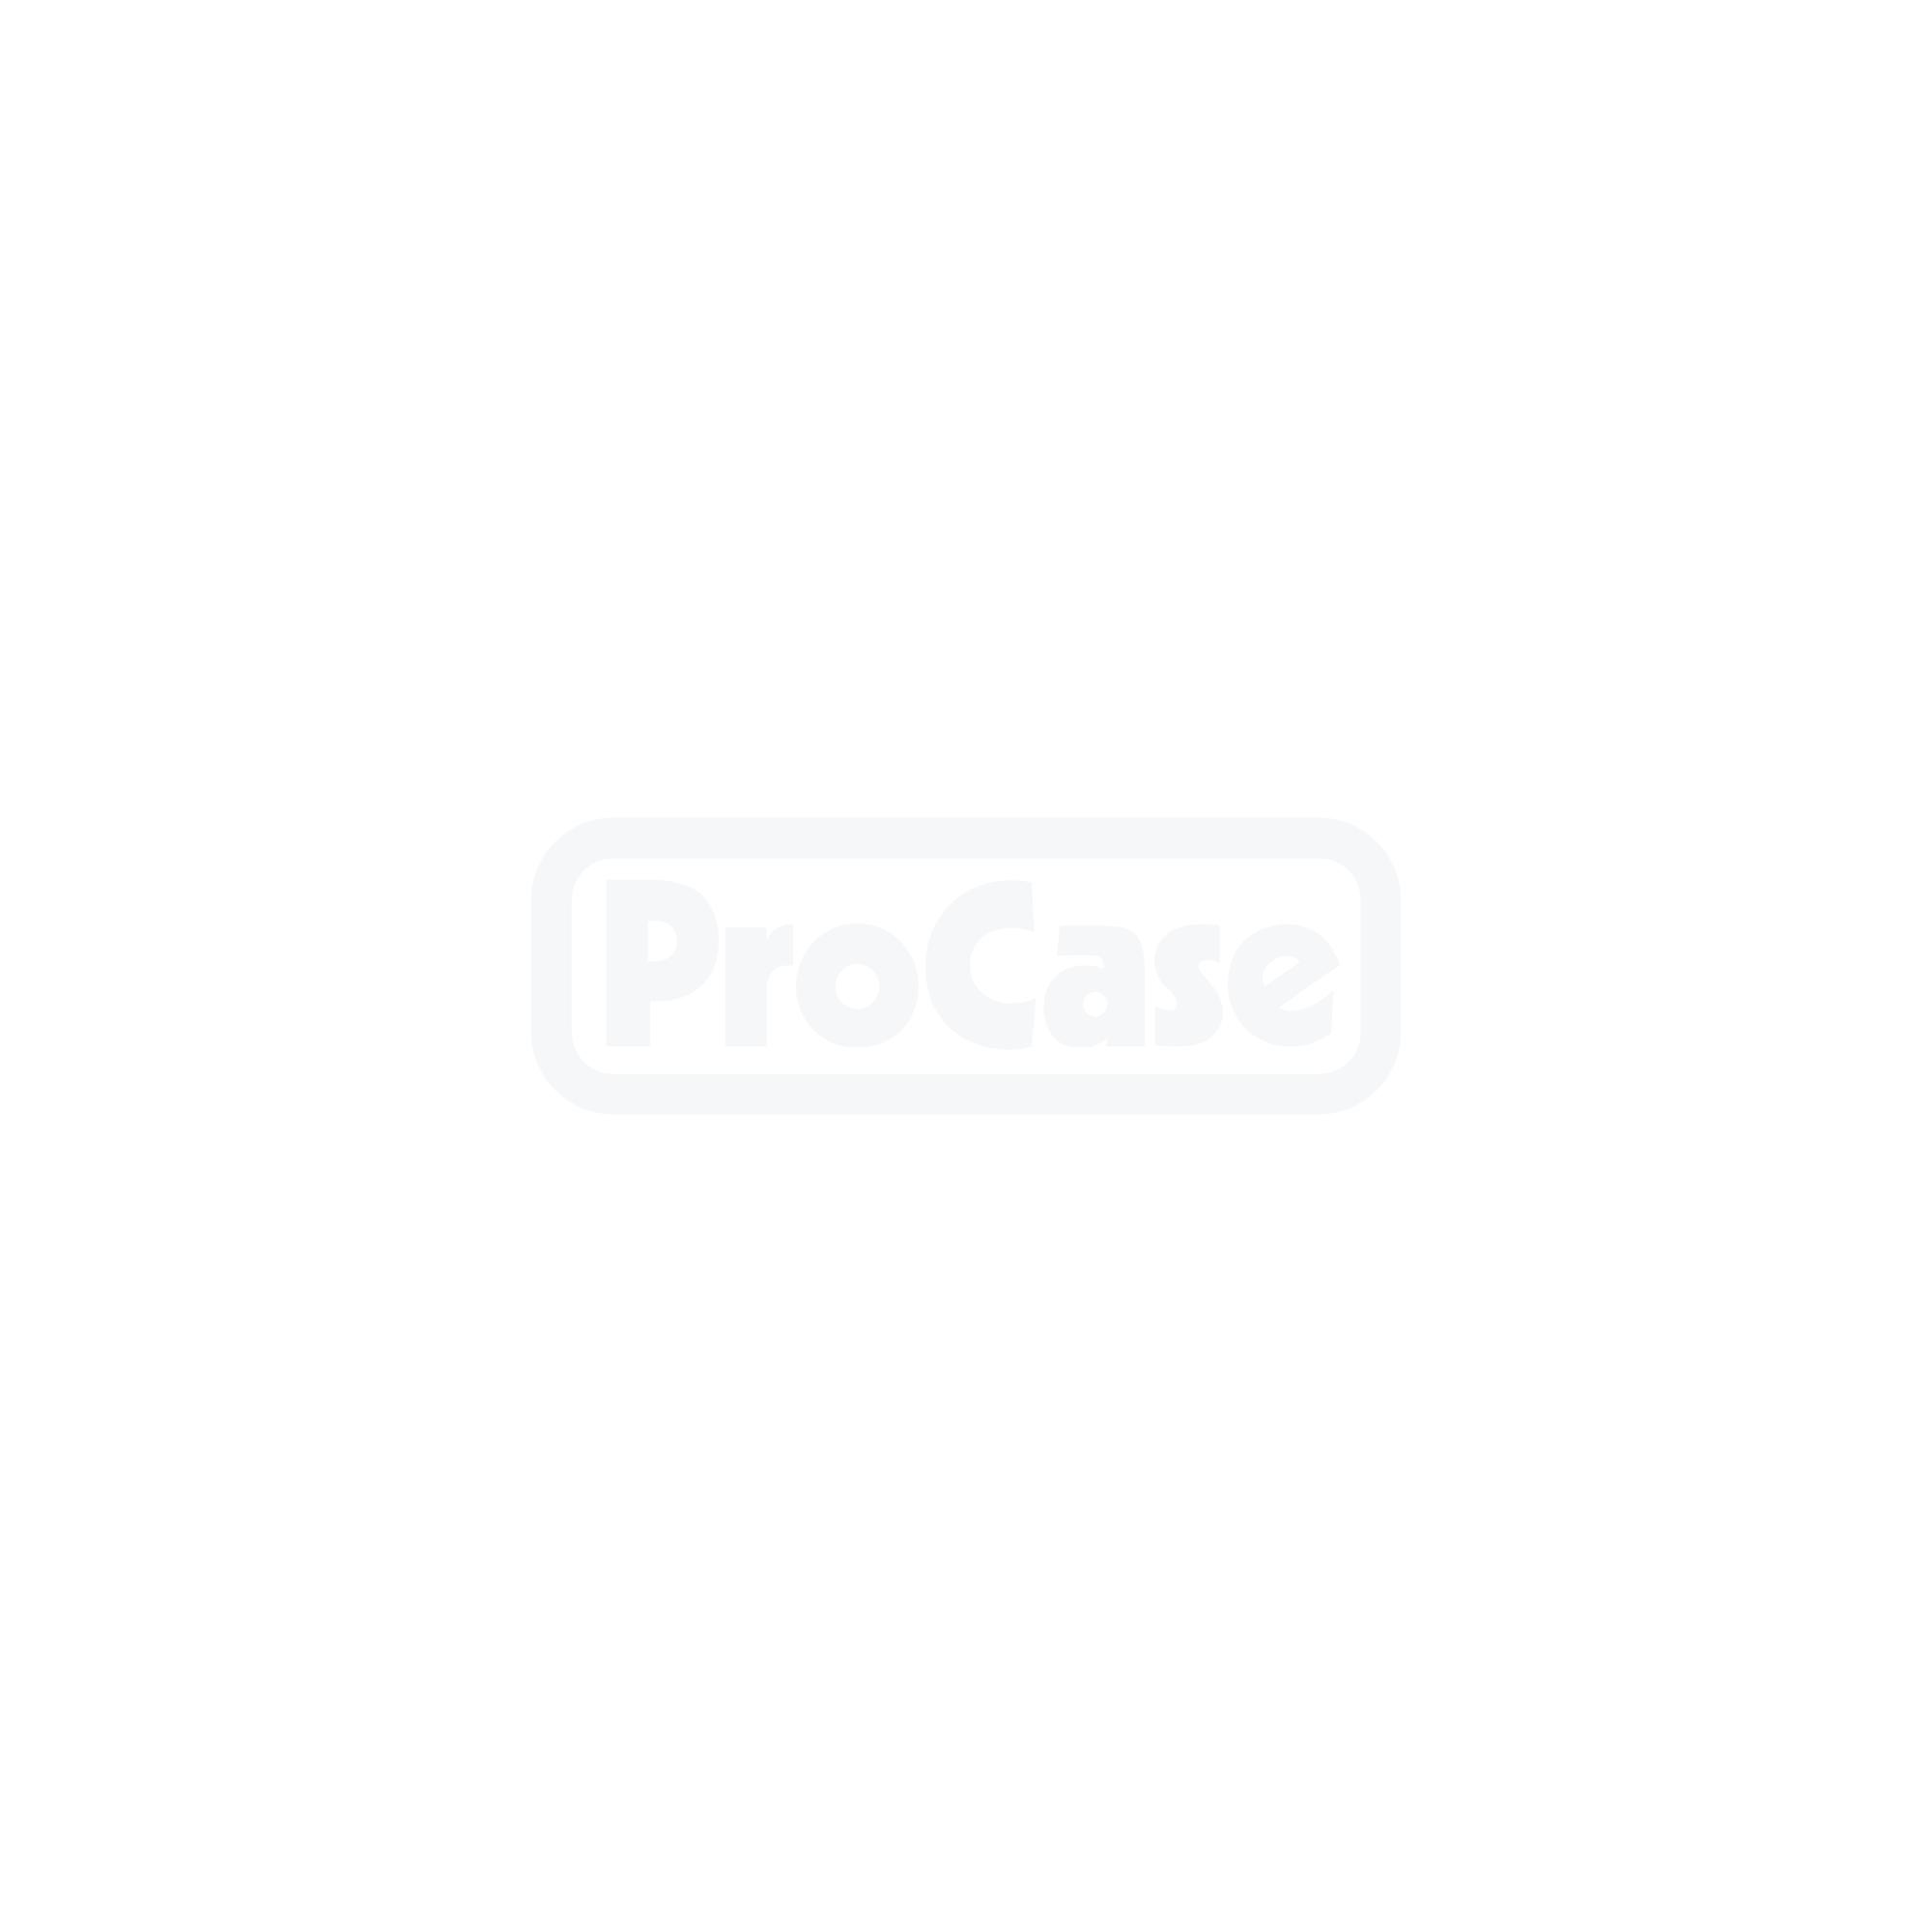 Flightcase für Panasonic TX-26LX70F 2